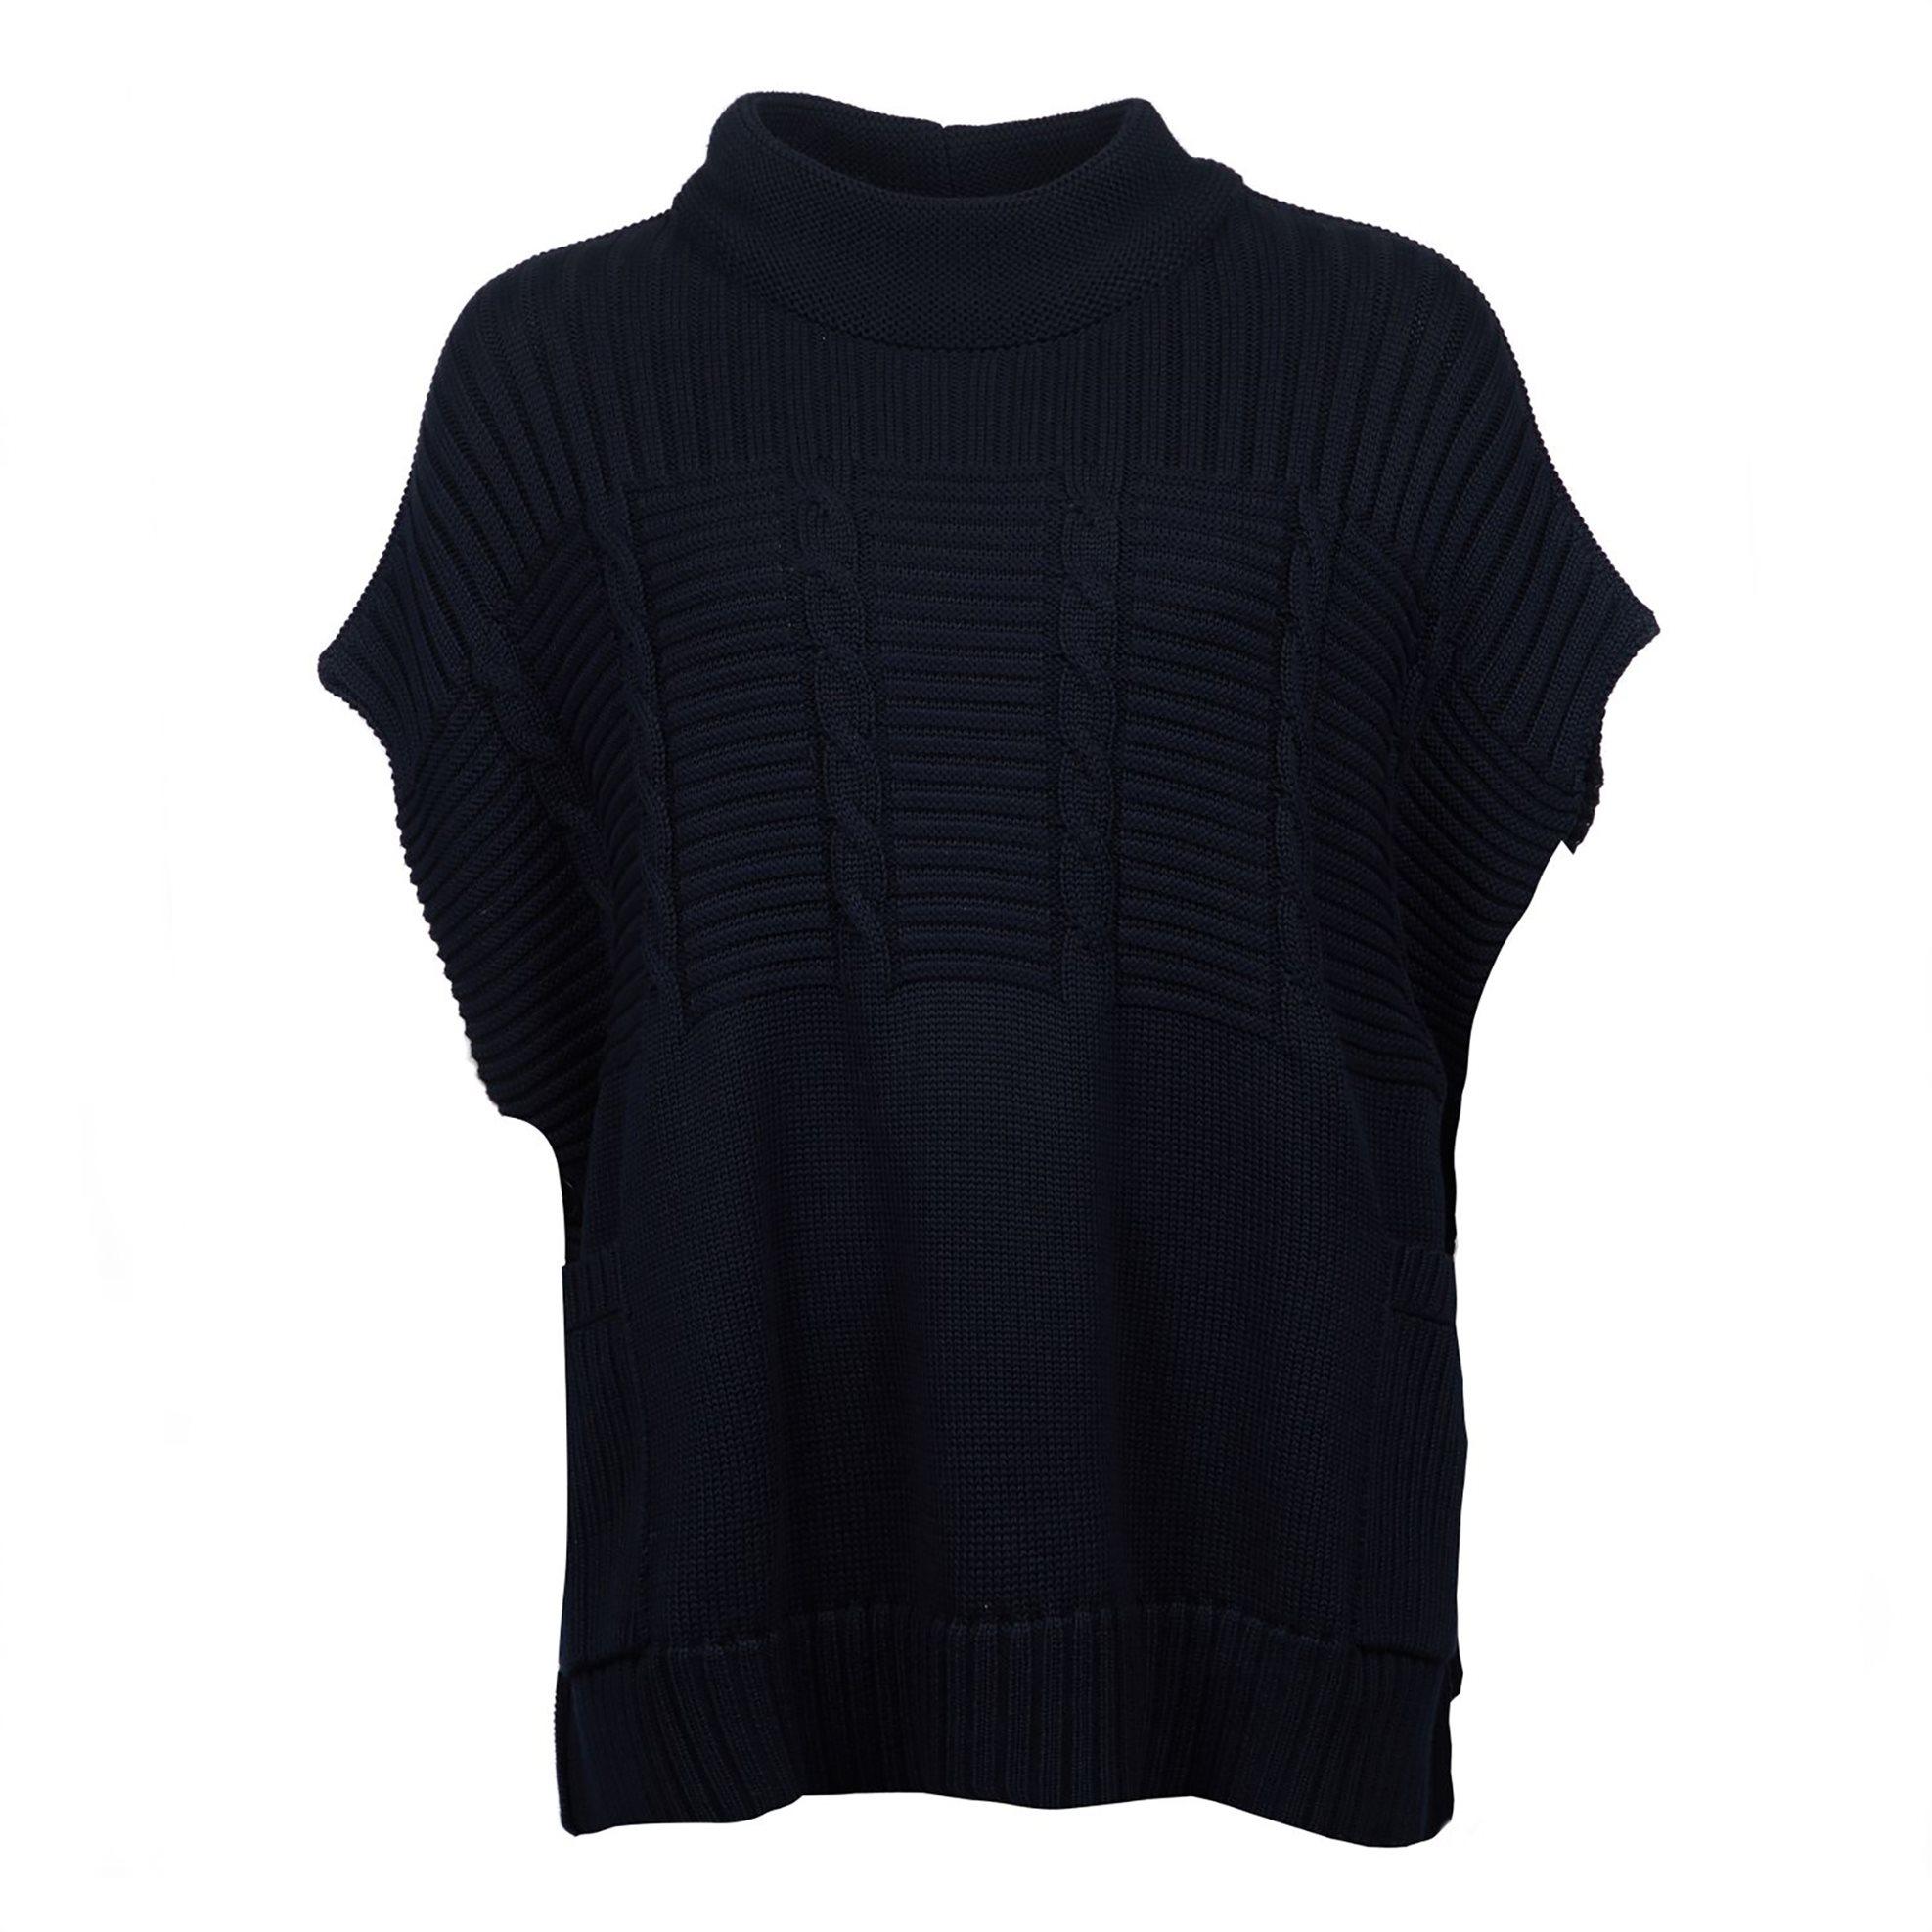 7cae992a0998 Barbour γυναικεία πλεκτή μπλούζα με κουμπιά Sherwood - LKN0887 - Μπλε Σκούρο